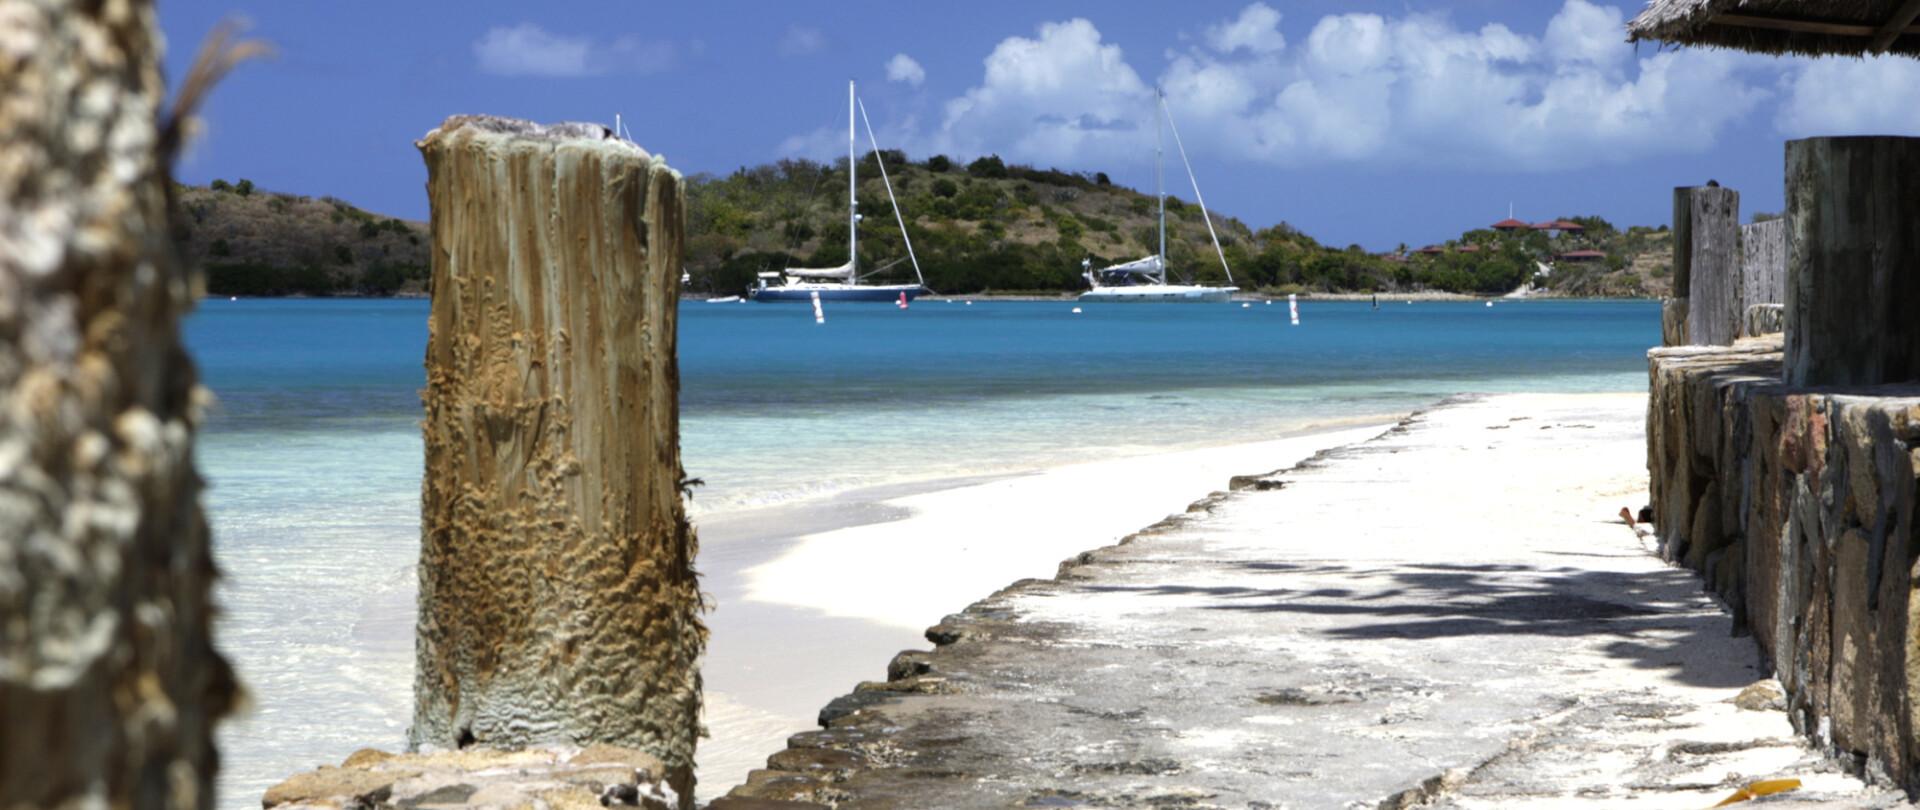 Edmiston Attending the 2014 Antigua Charter Yacht Show photo 2